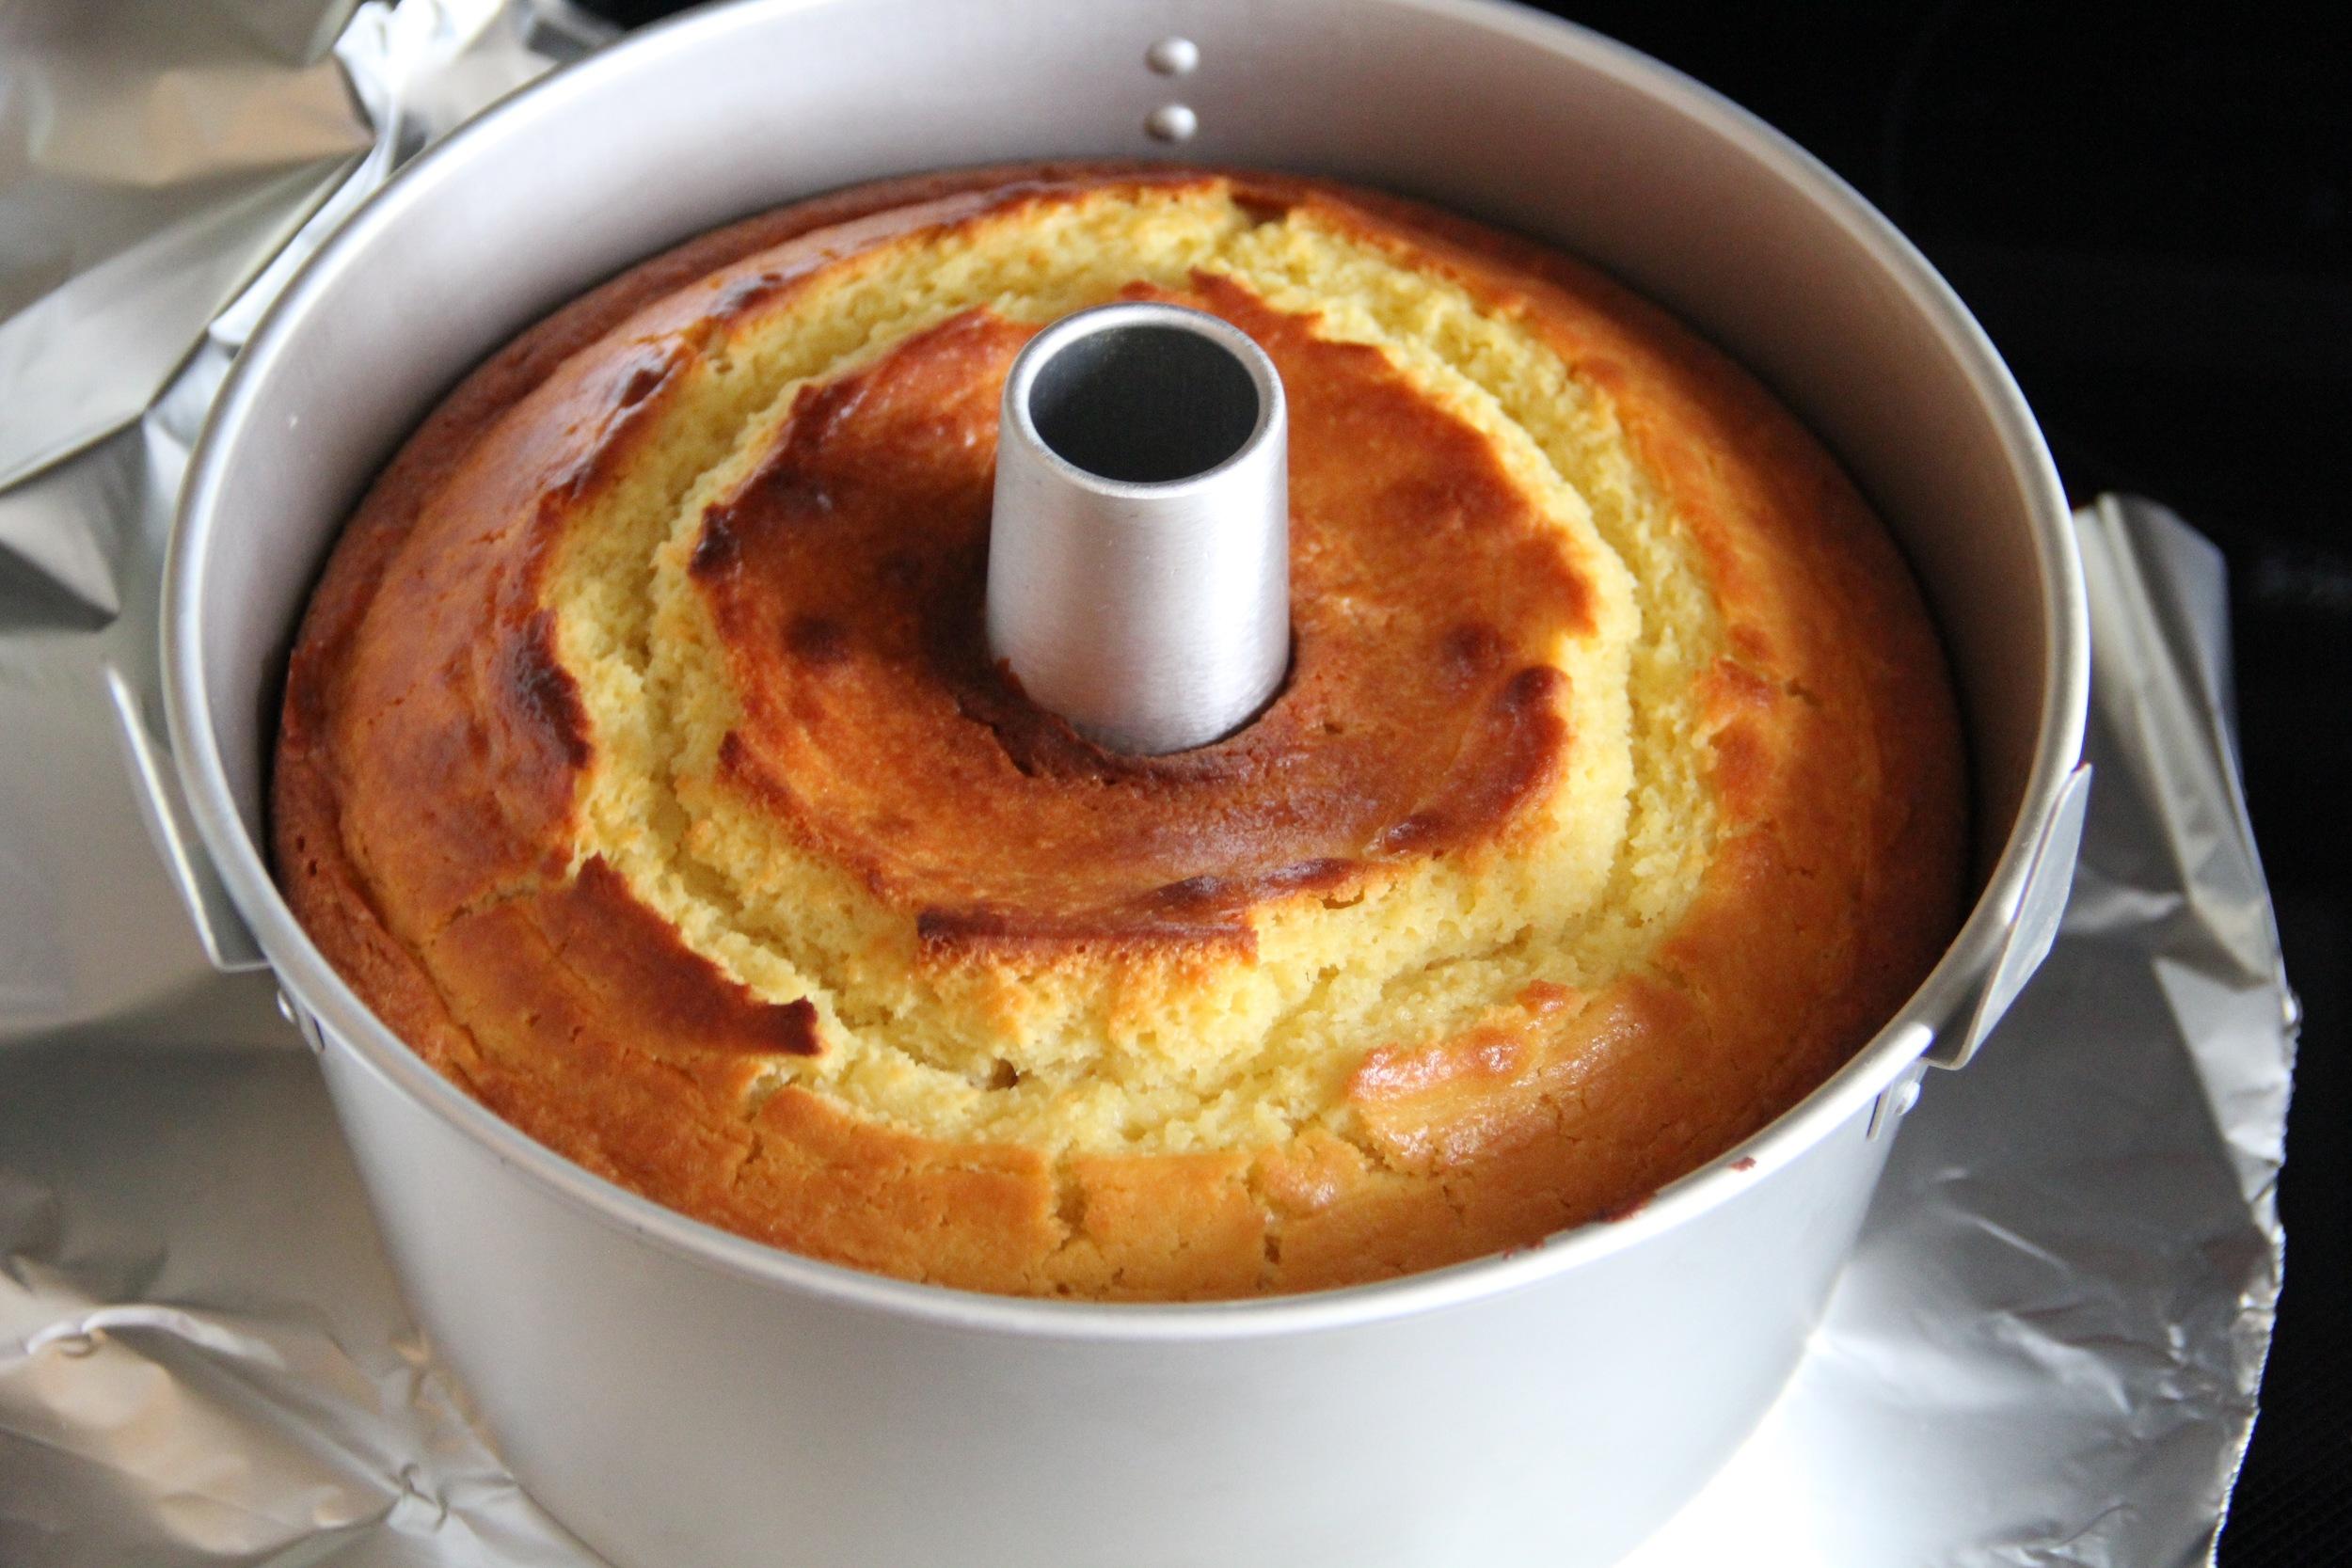 Ina Garten Lemon Yogurt Cake Baked.jpg